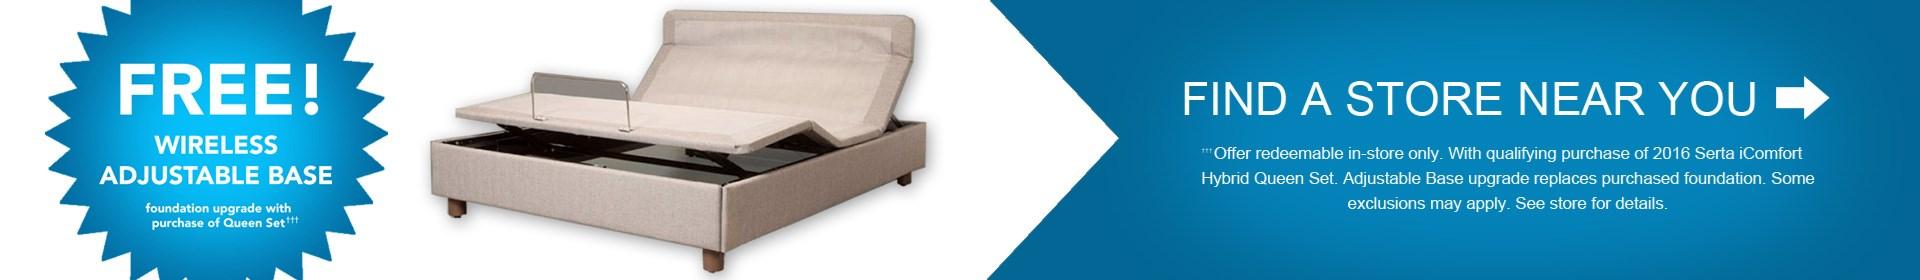 Free Adjustable Base with Serta Mattress at Royal Furniture